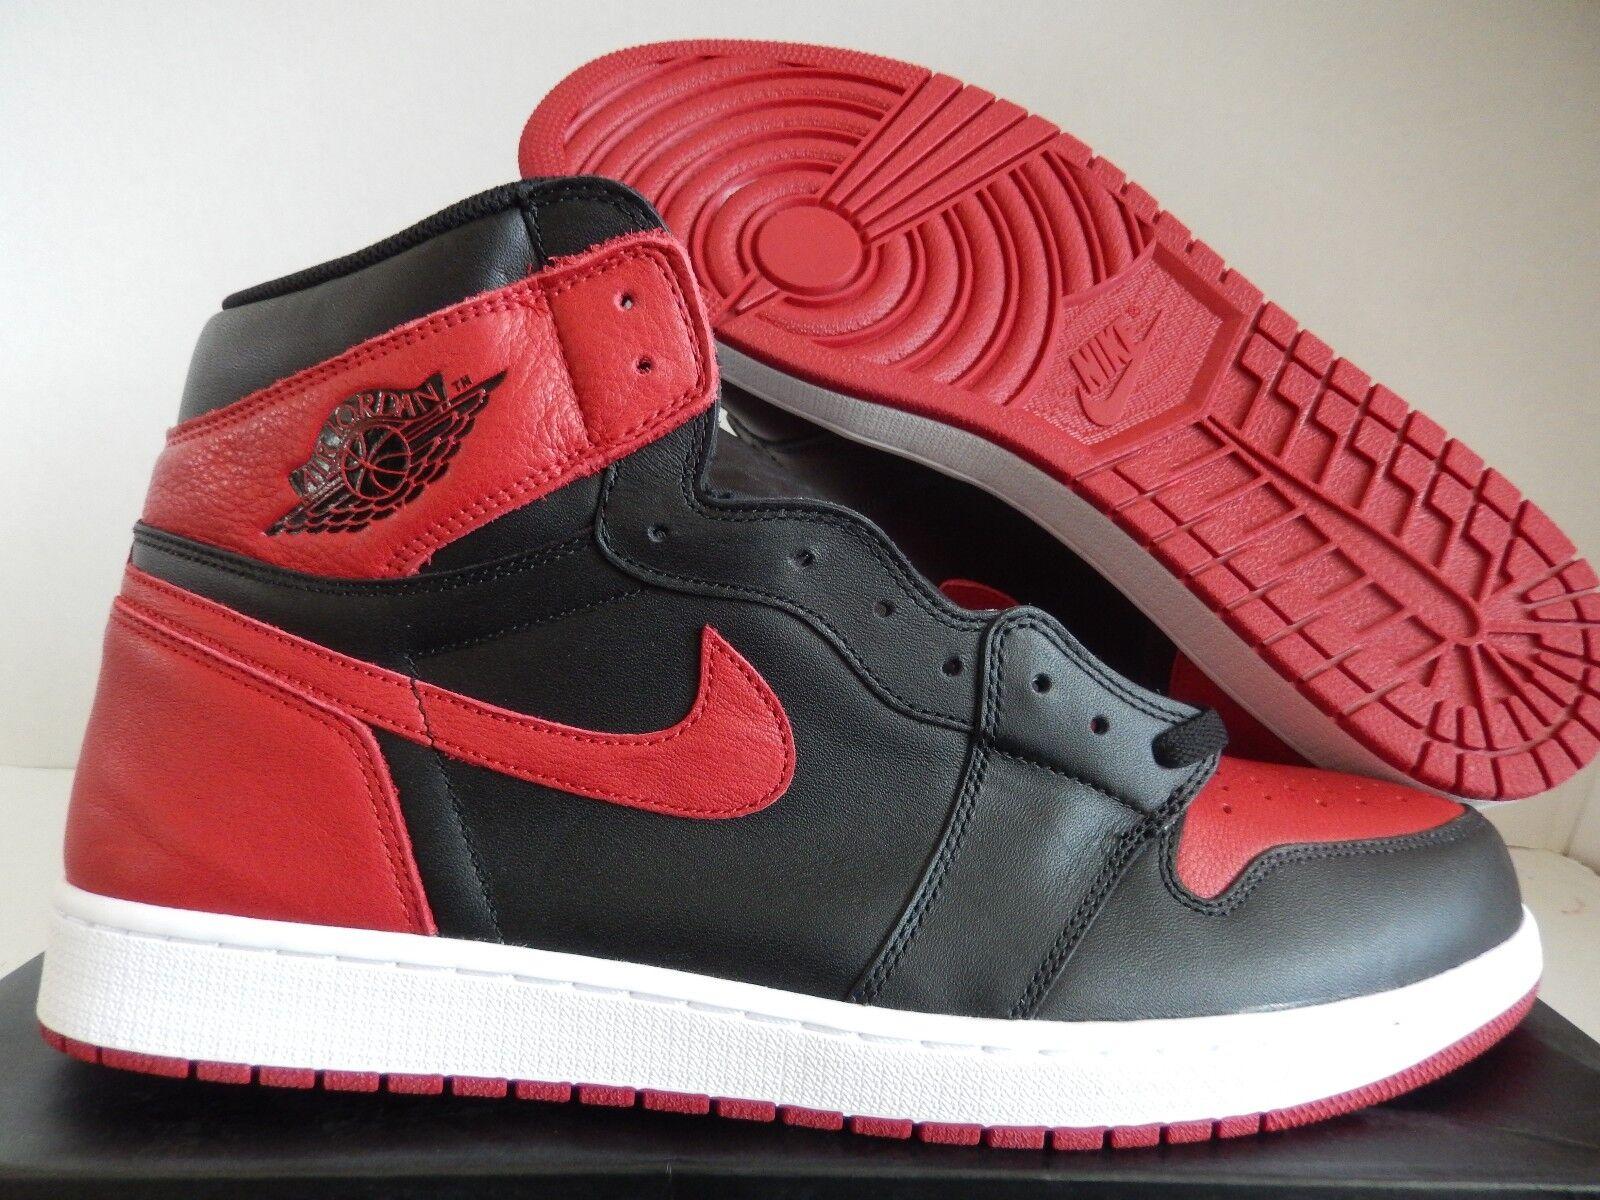 Nike air jordan 1 'alto og allevati vietato nero-red-wht sz 18 [555088-001]